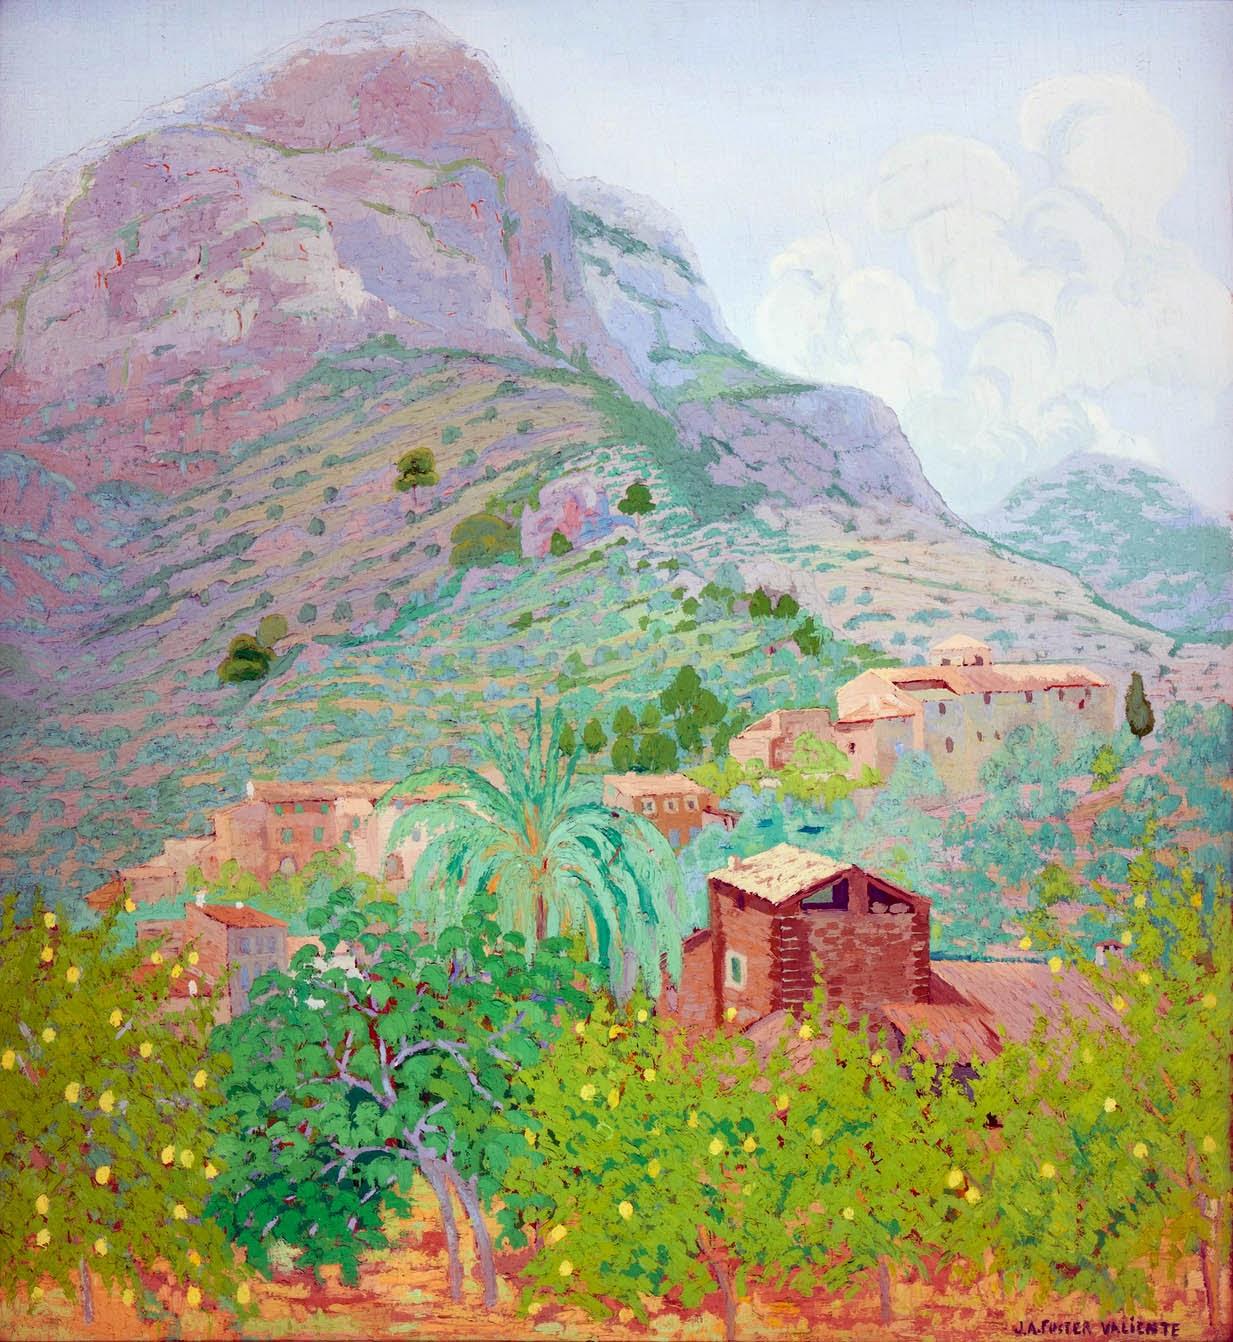 Joan Antoni Fuster i Valiente, Paisaje de Paisaje de Mallorca, Mallorca en Pintura, Serra de Tramontana